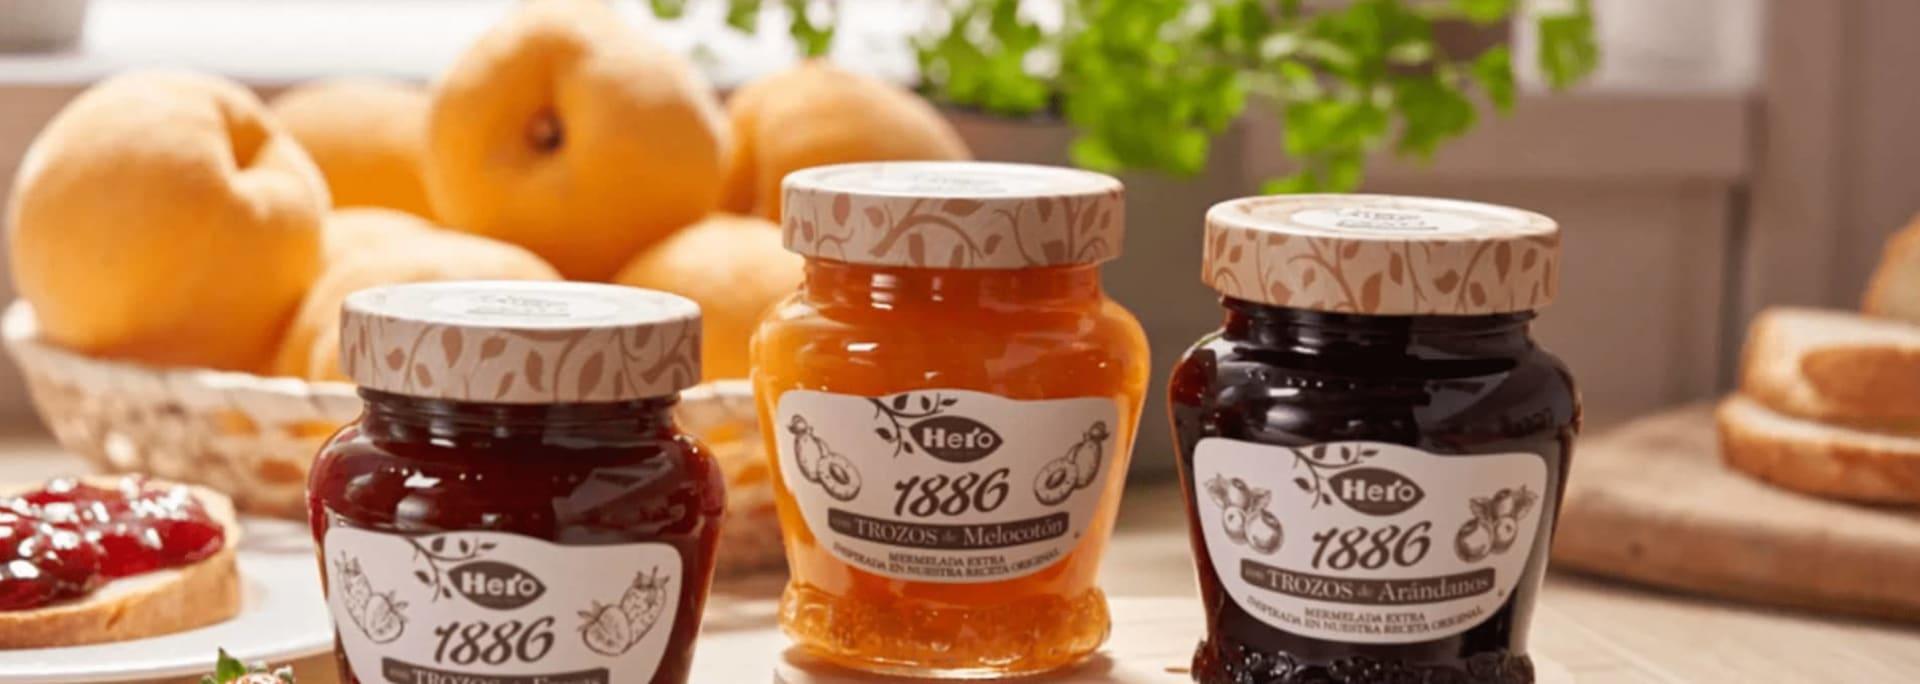 Reutilizar tarros de mermelada 1886 de Hero